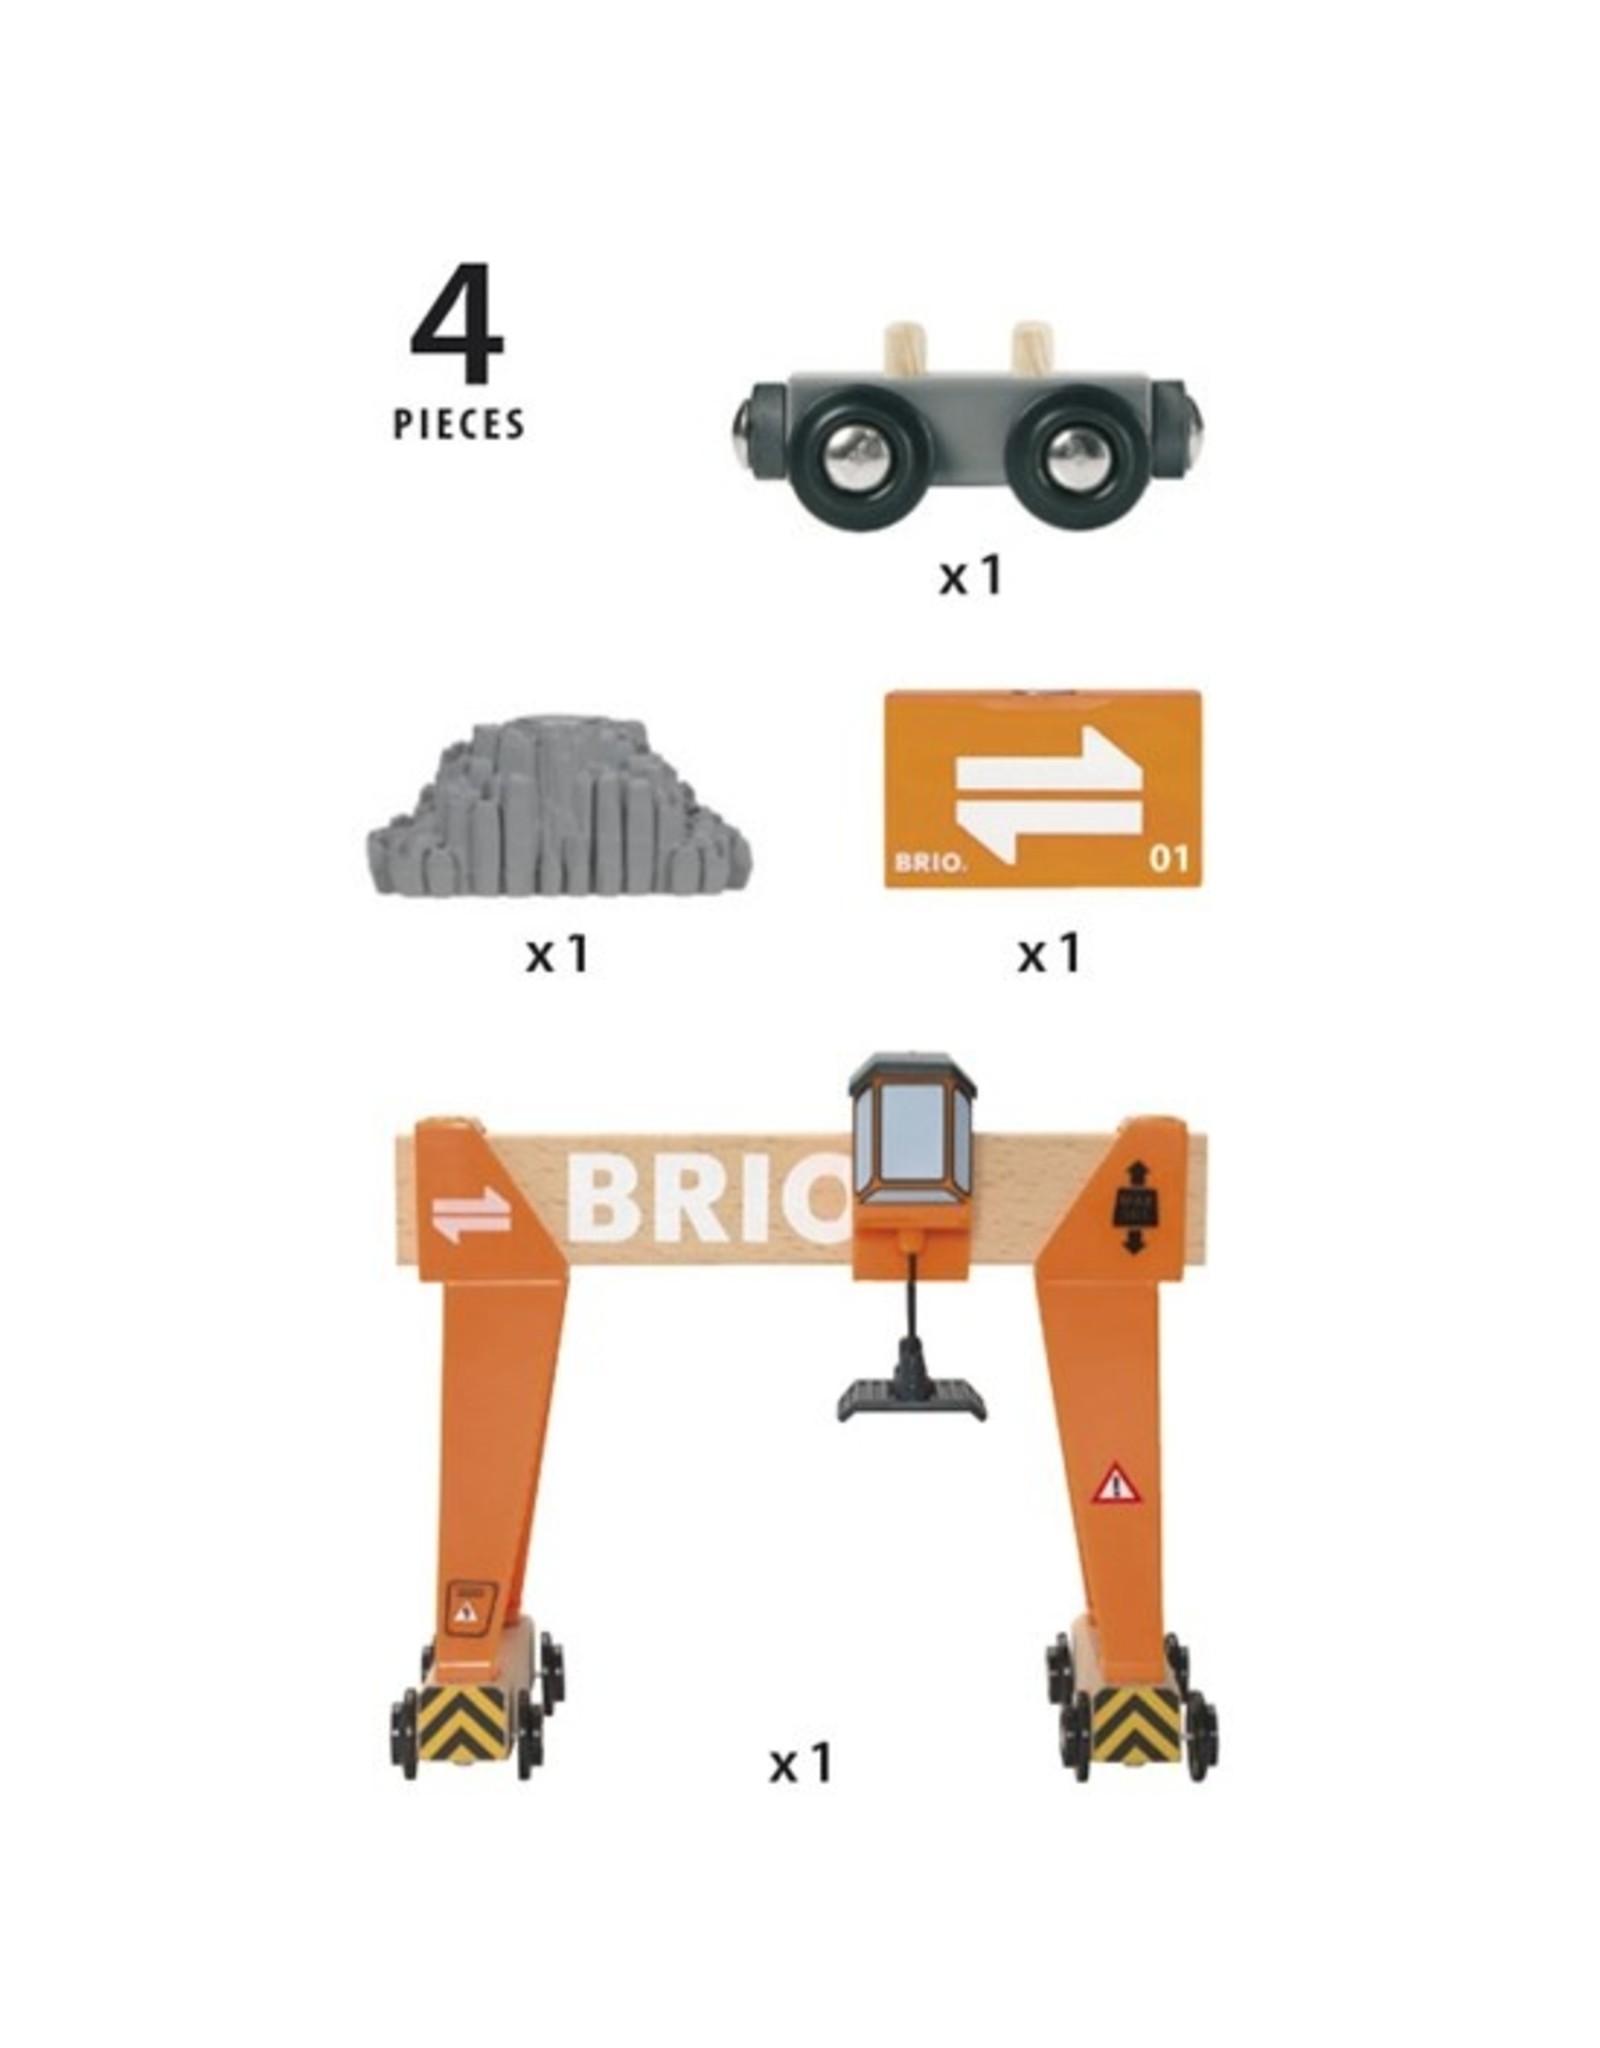 Brio Gantry Crane